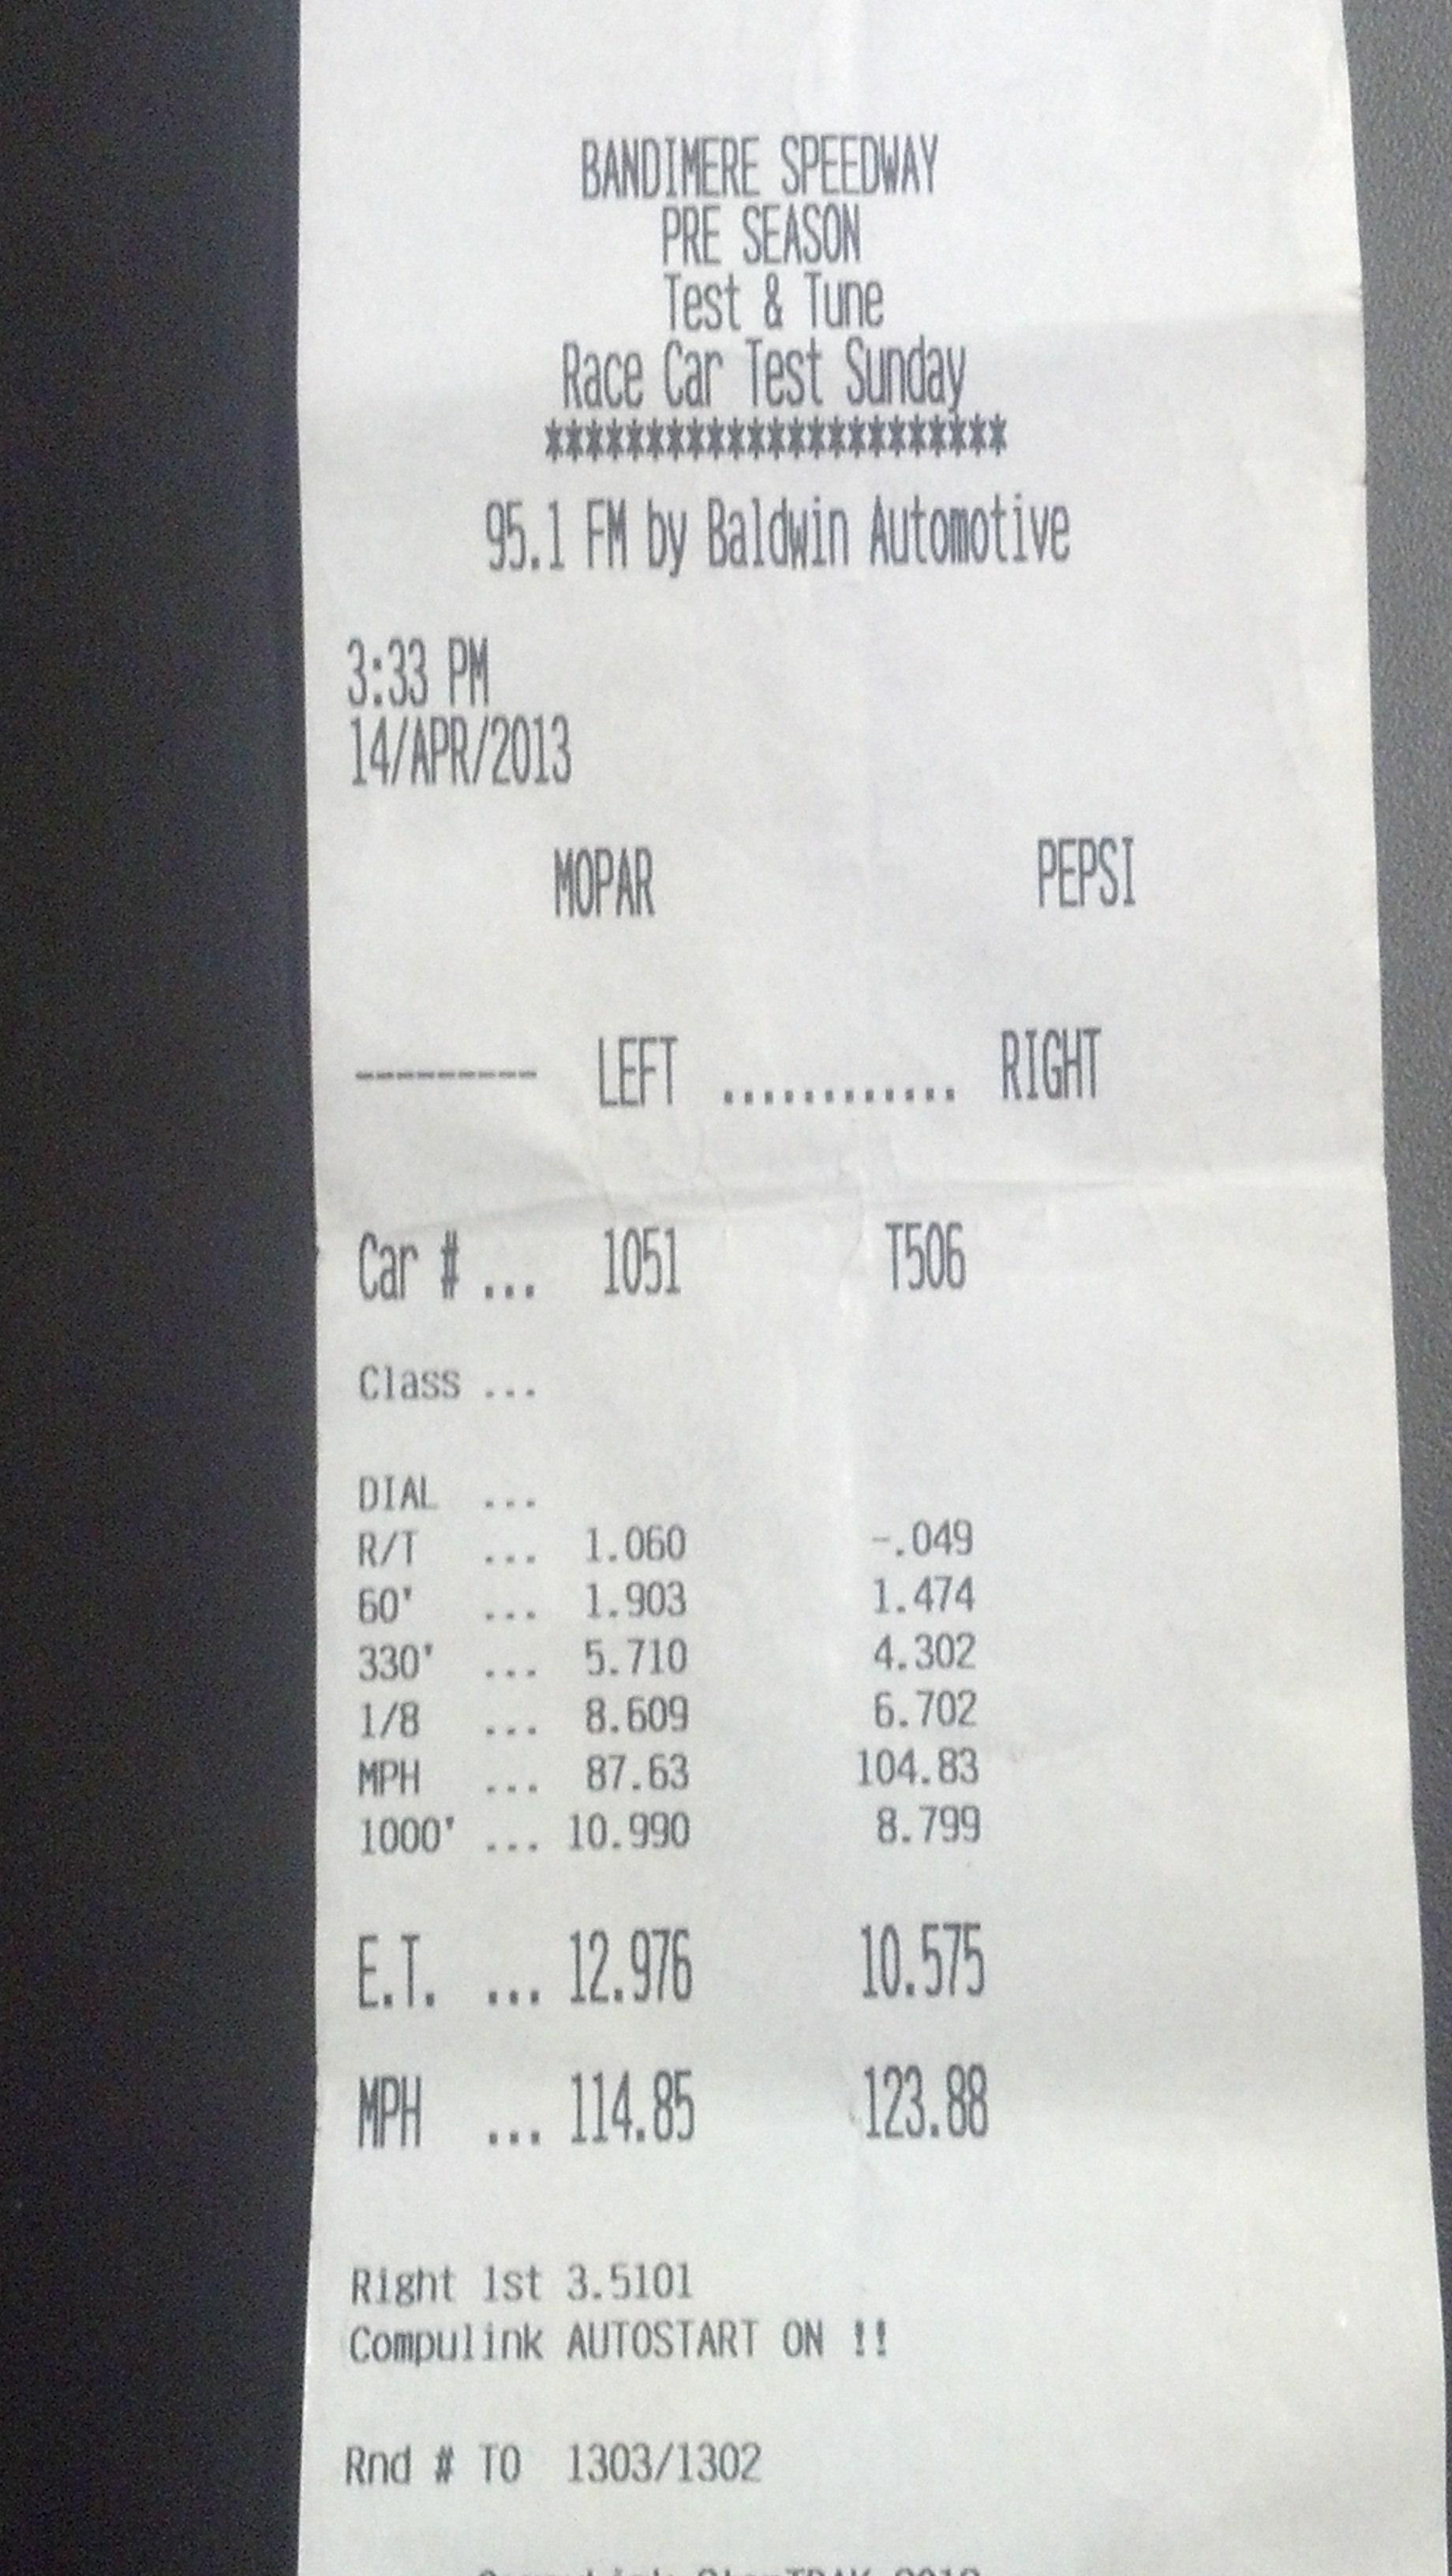 Saab 900 Timeslip Scan